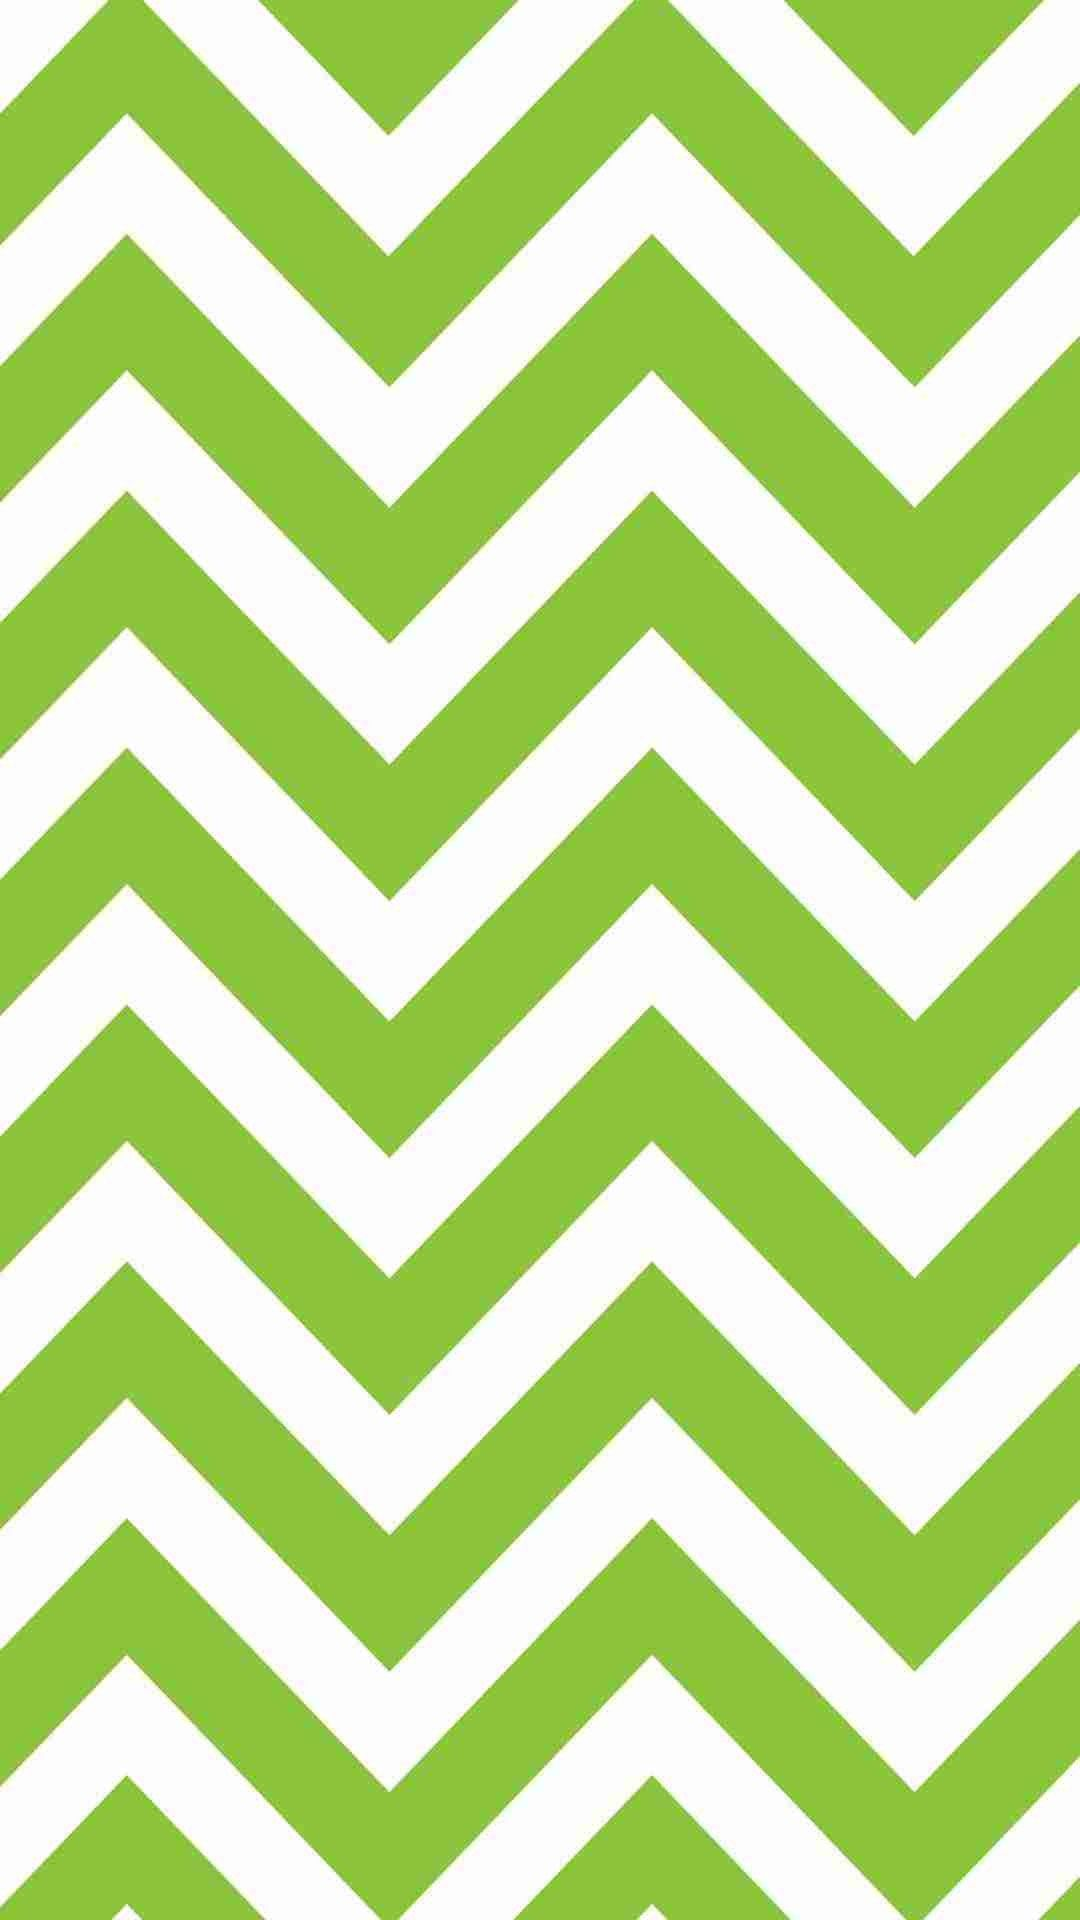 Light Green Chevron IPhone 6 Plus Wallpaper